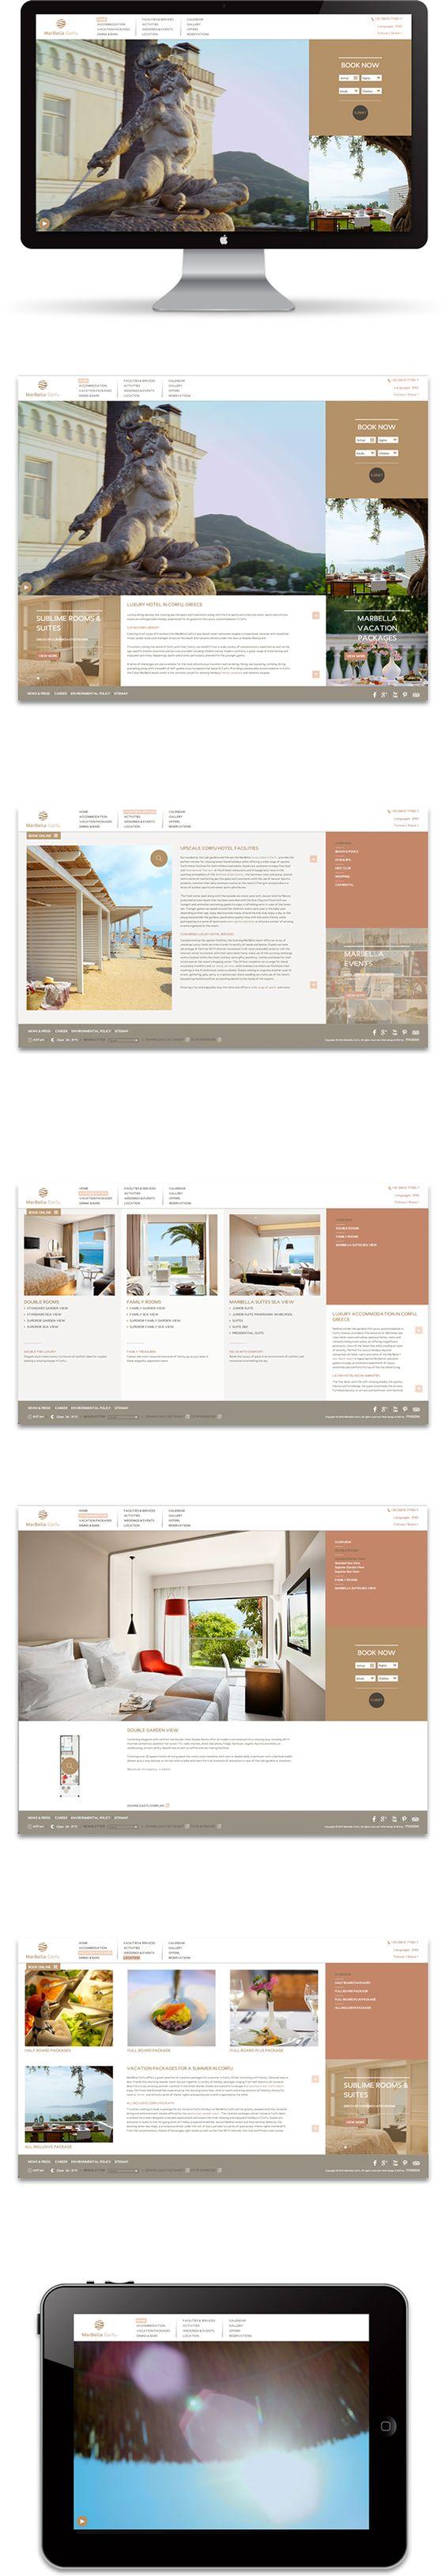 The Marbella Website